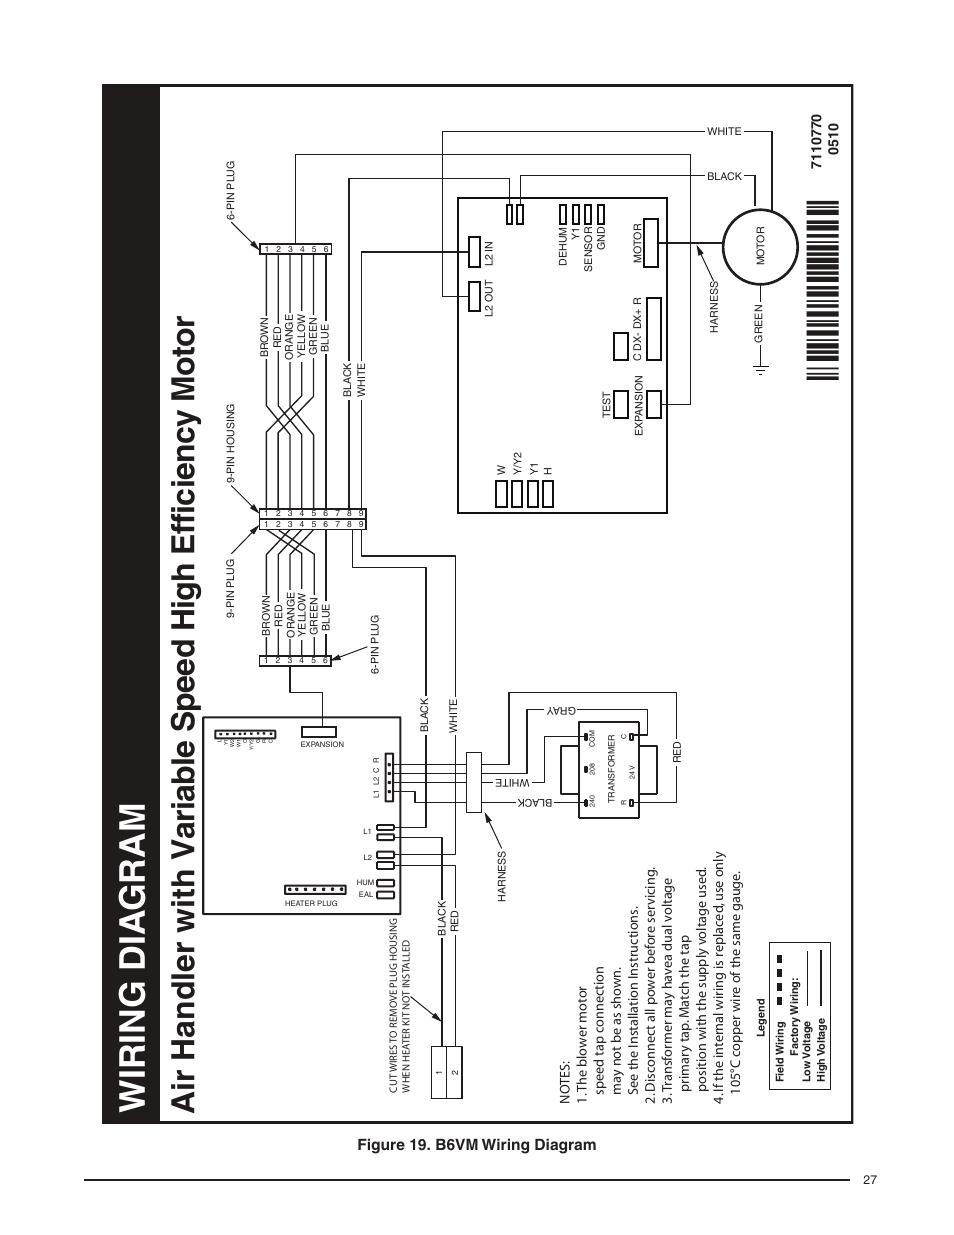 Figure 19. b6vm wiring diagram, Figure, Wiring dia gram